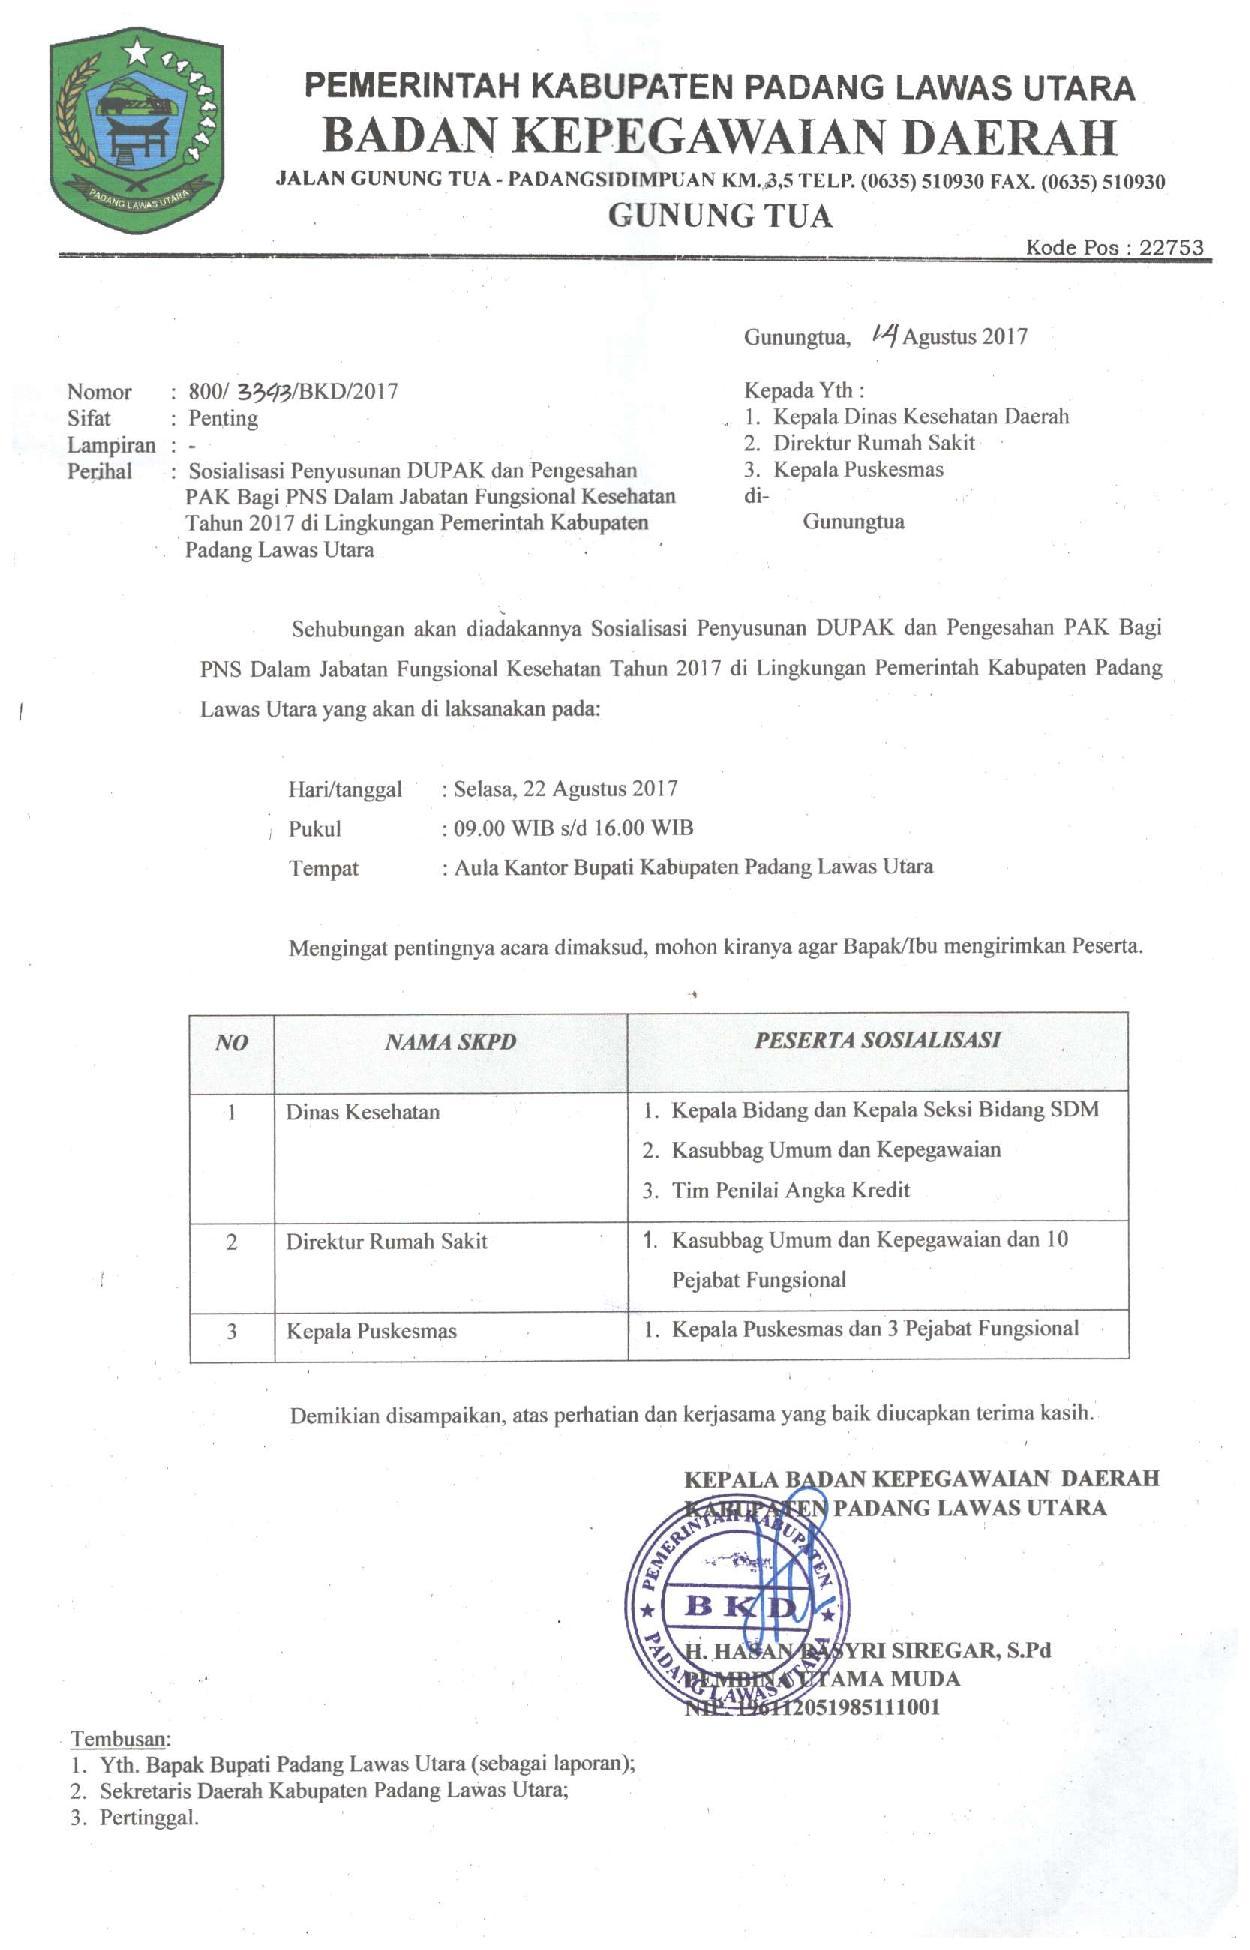 Undangan Sosialisasi Penyusunan DUPAK PNS Jabatan Fungsional Tertentu Kesehatan